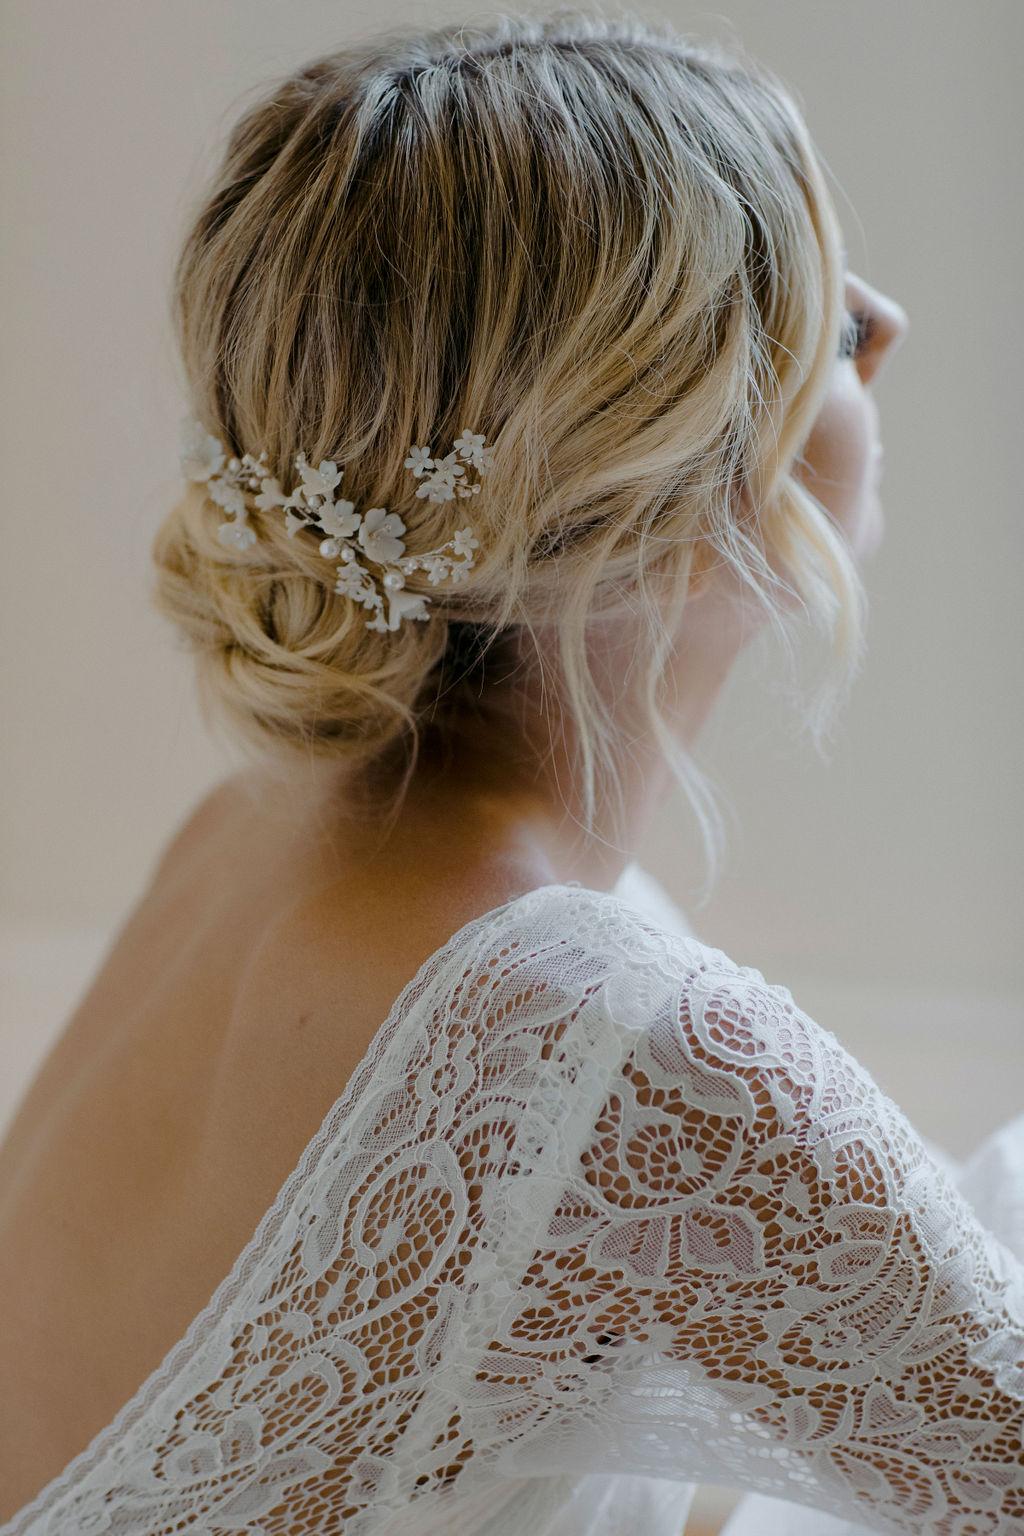 CHERRY BLOSSOM | WEDDING HAIR PIECES by TANIA MARAS